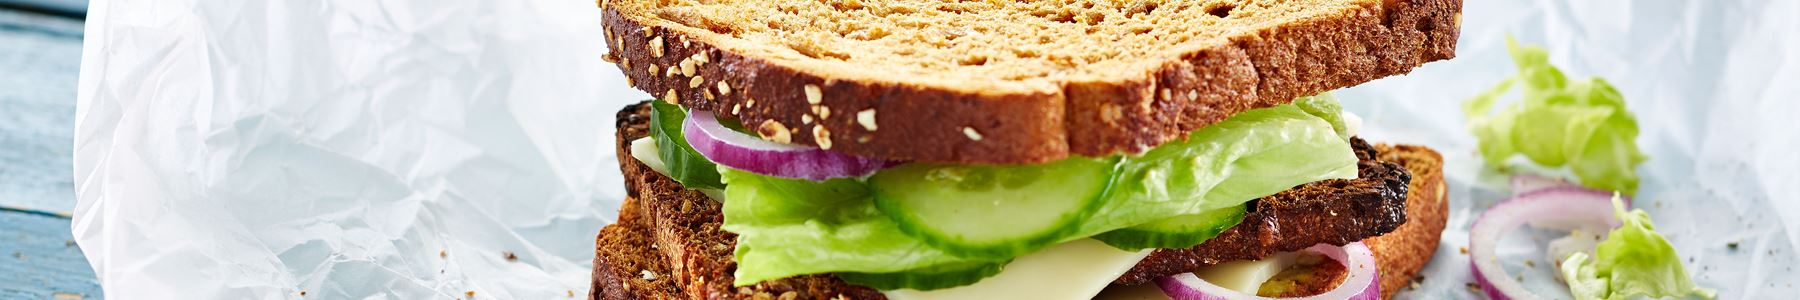 Fedtfattig + Vegetarisk madplan + Madpakke